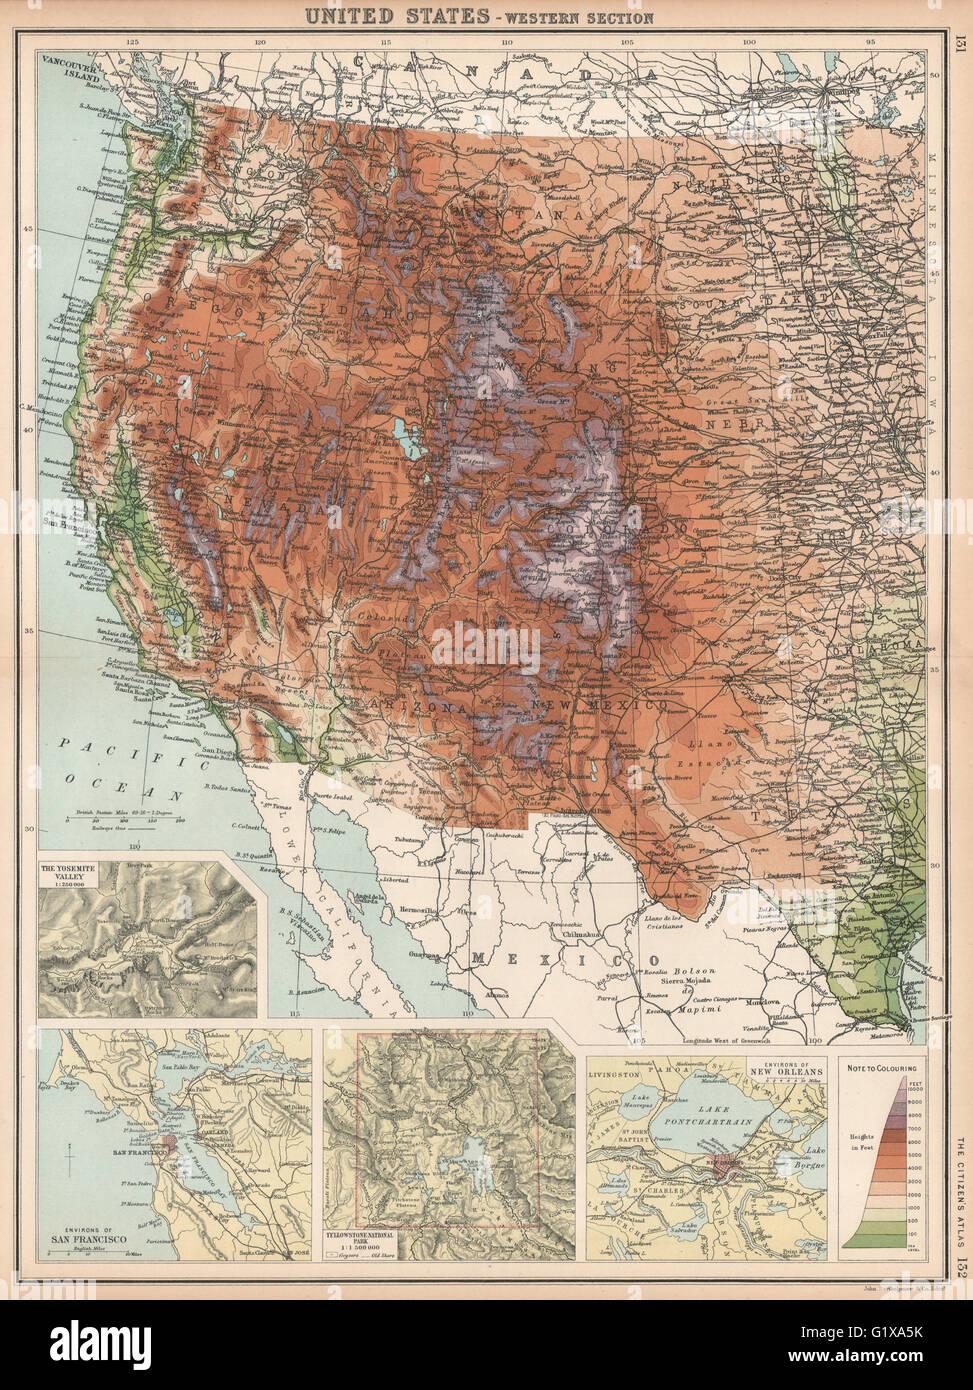 ROCKY MOUNTAINS. USA West. Yosemite San Francisco Yellowstone, 1912 on bass lake map, fresno map, yellowstone west map, atlanta west map, stockton map, clovis west map, ontario west map, minto west map, grand canyon west map, greyhound west map, rocky mountain west map, washington west map, huntington lake map, united states west map, windsor west map, vieux montreal map,